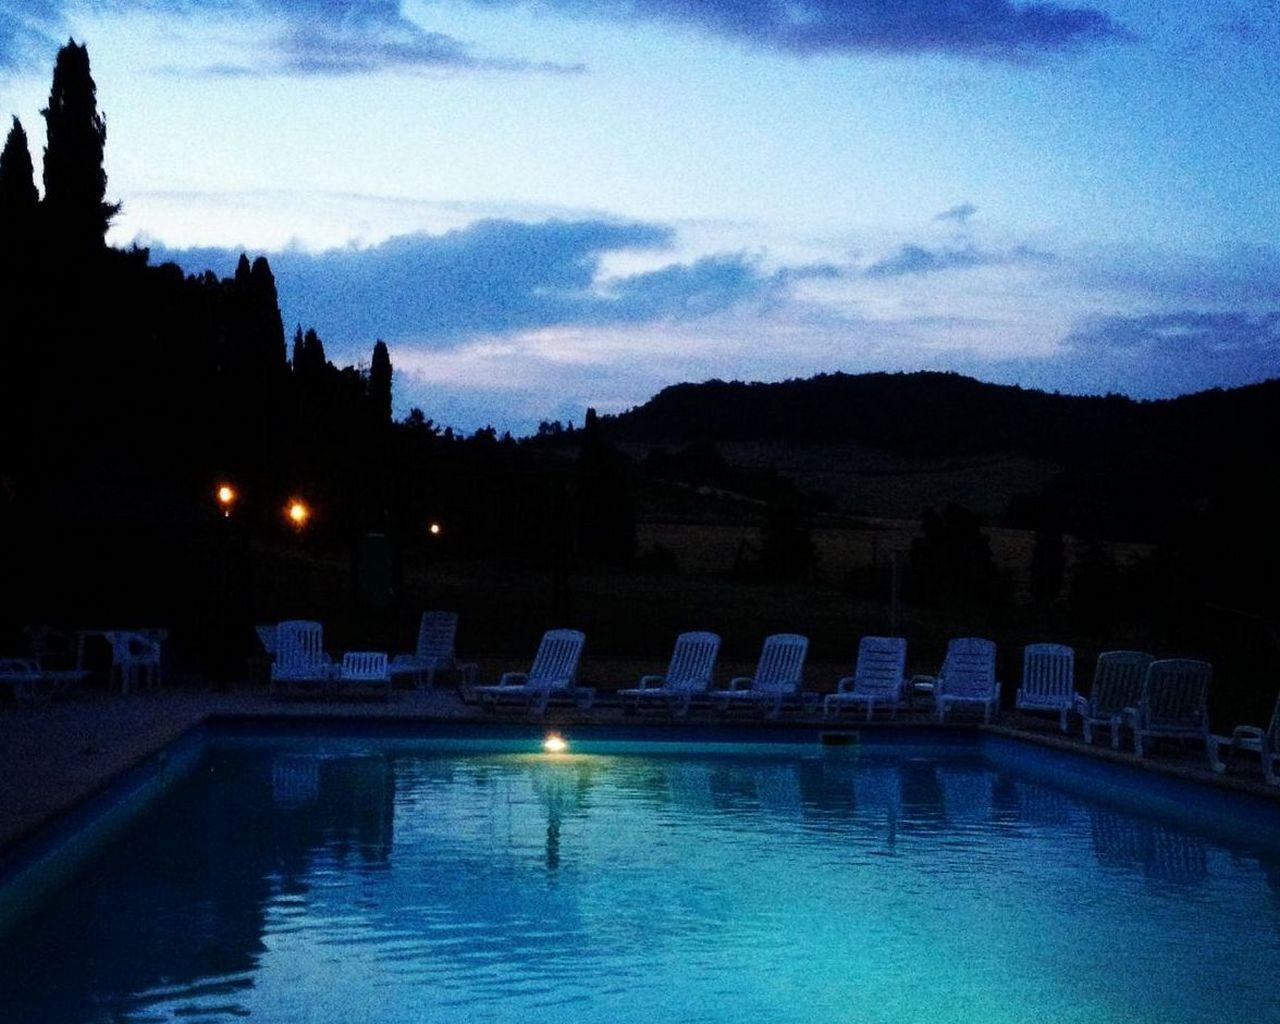 santa-felicita-paterna-turismo-umbria-agriturismo-vacanza-country-house-0-100_7